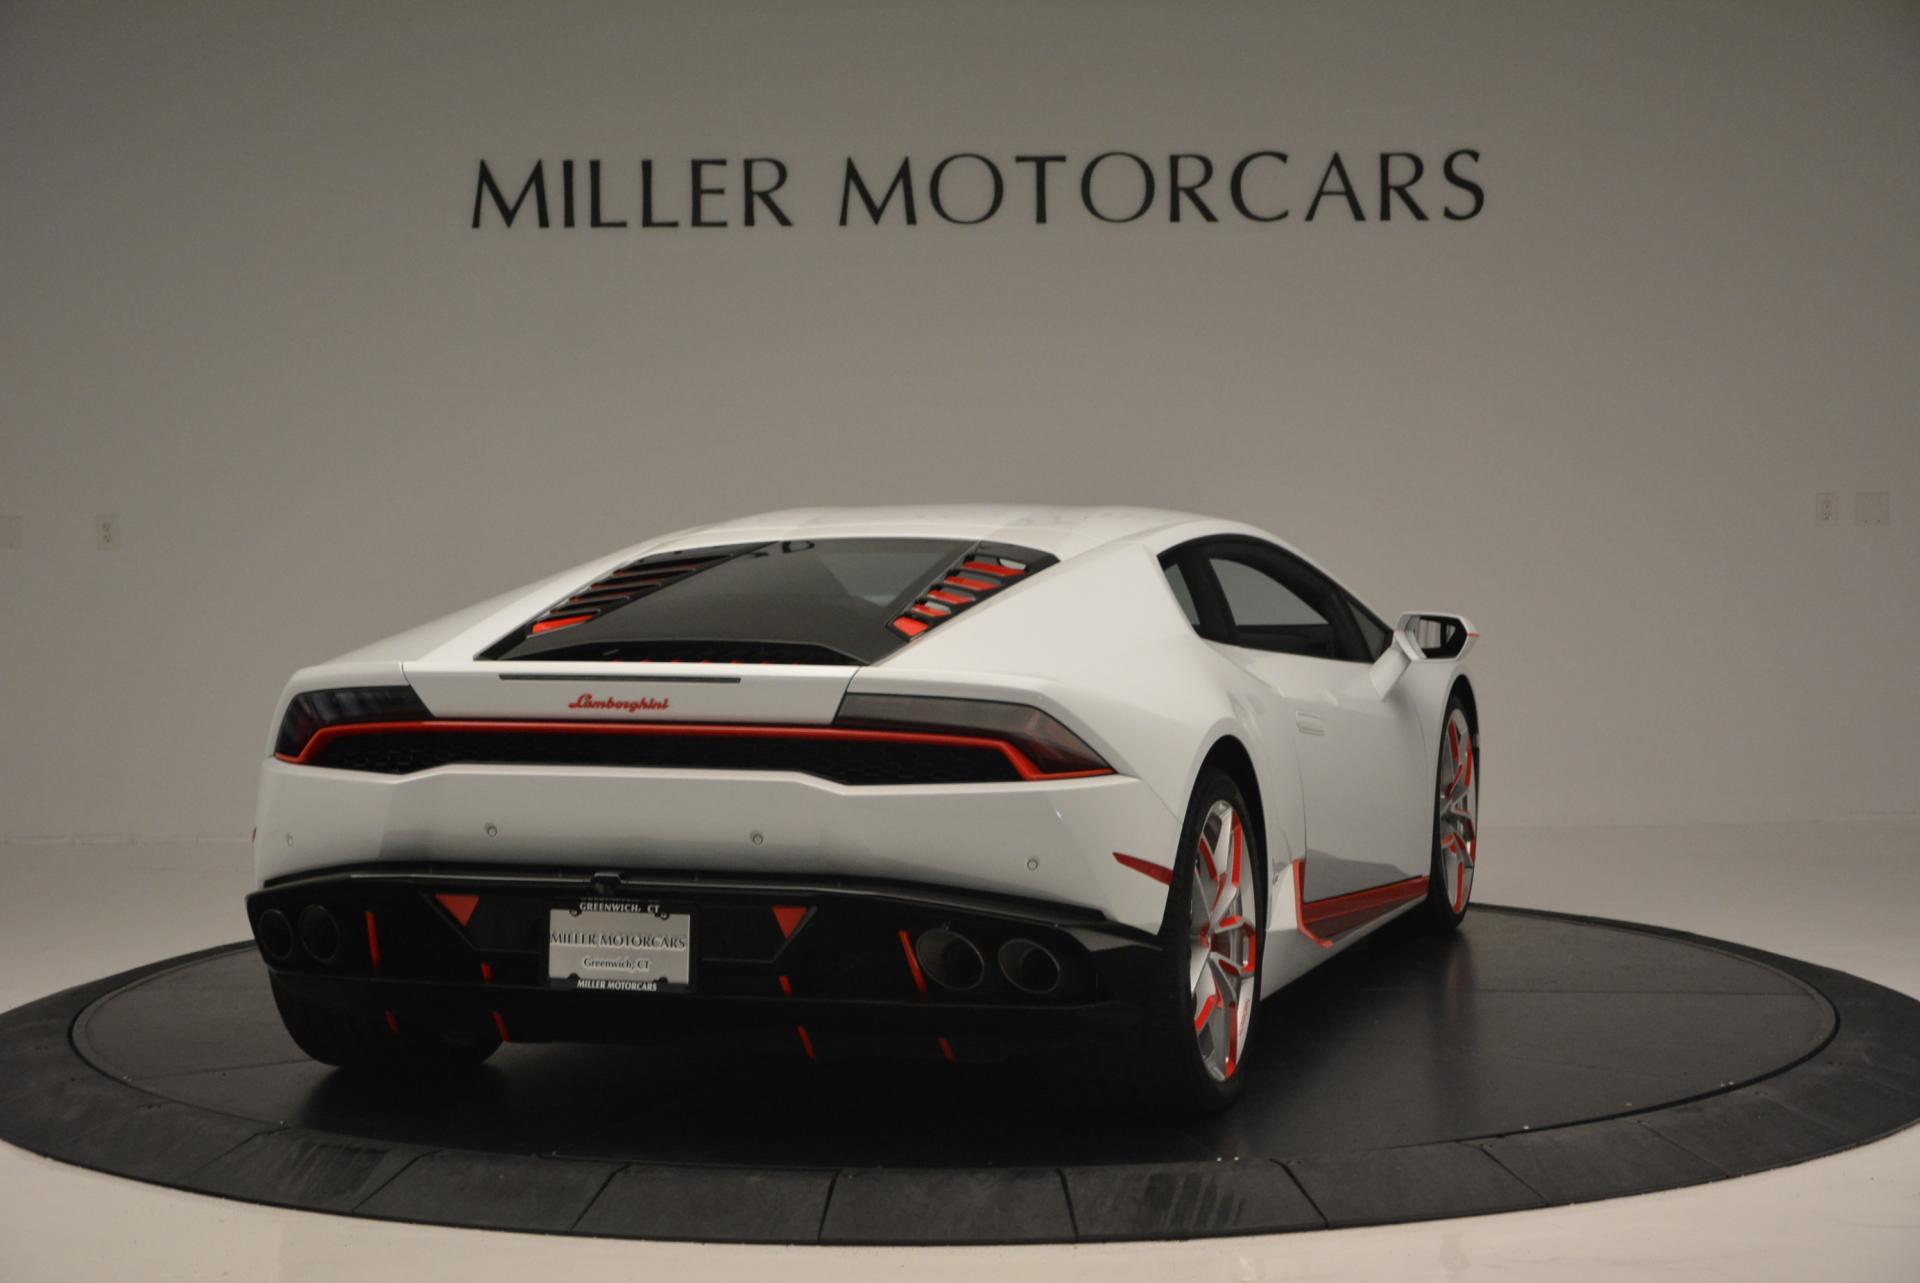 Used 2015 Lamborghini Huracan LP610-4 For Sale In Greenwich, CT 114_p9